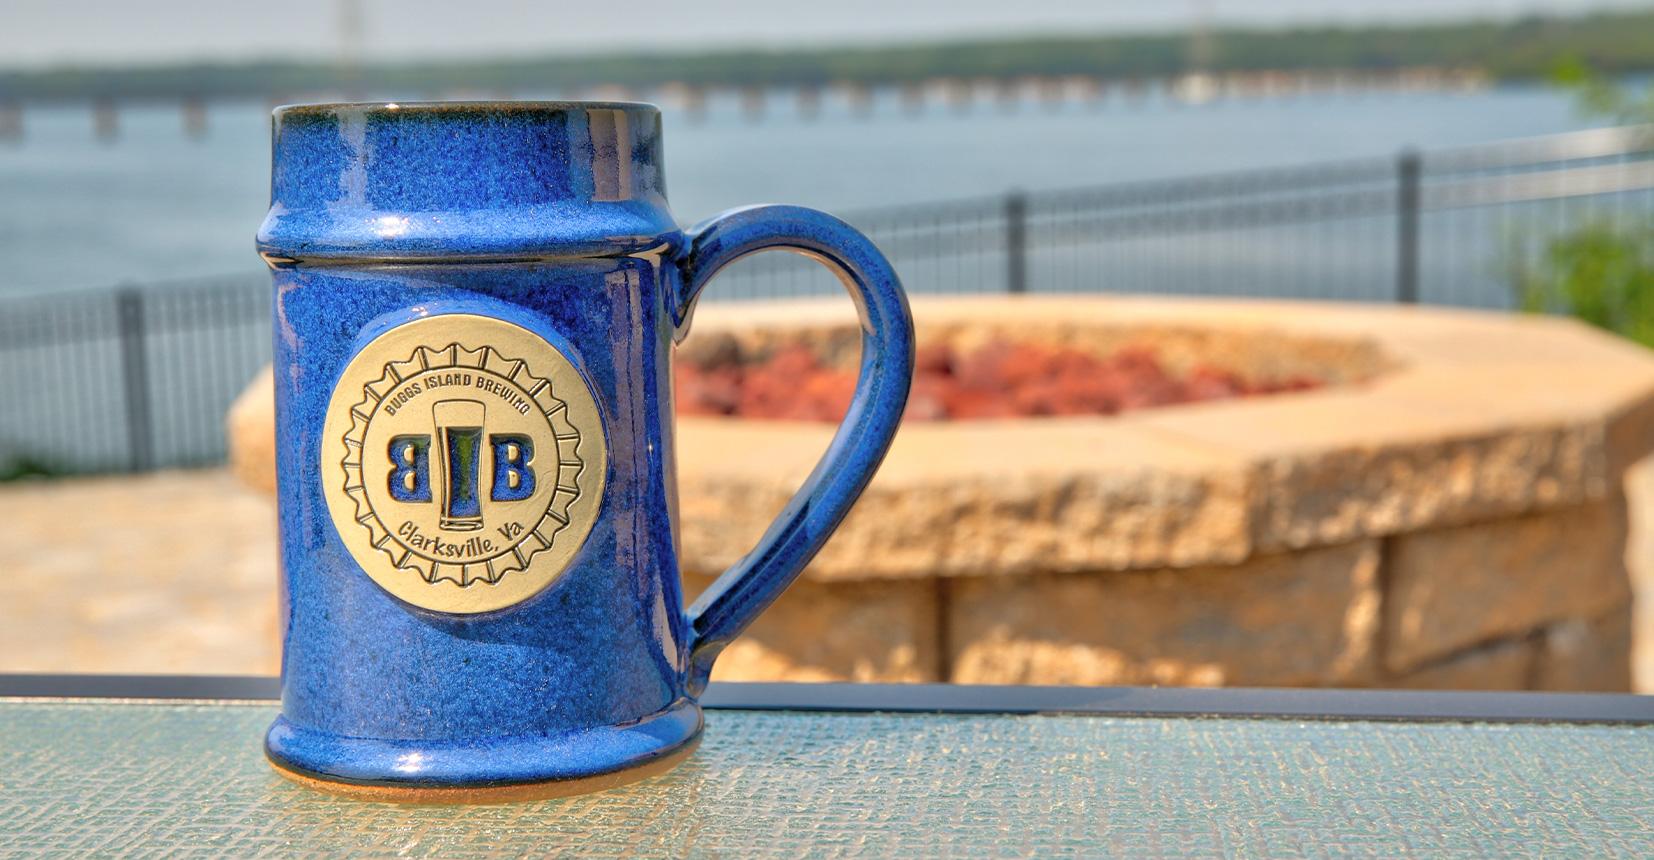 New BIB mug and location